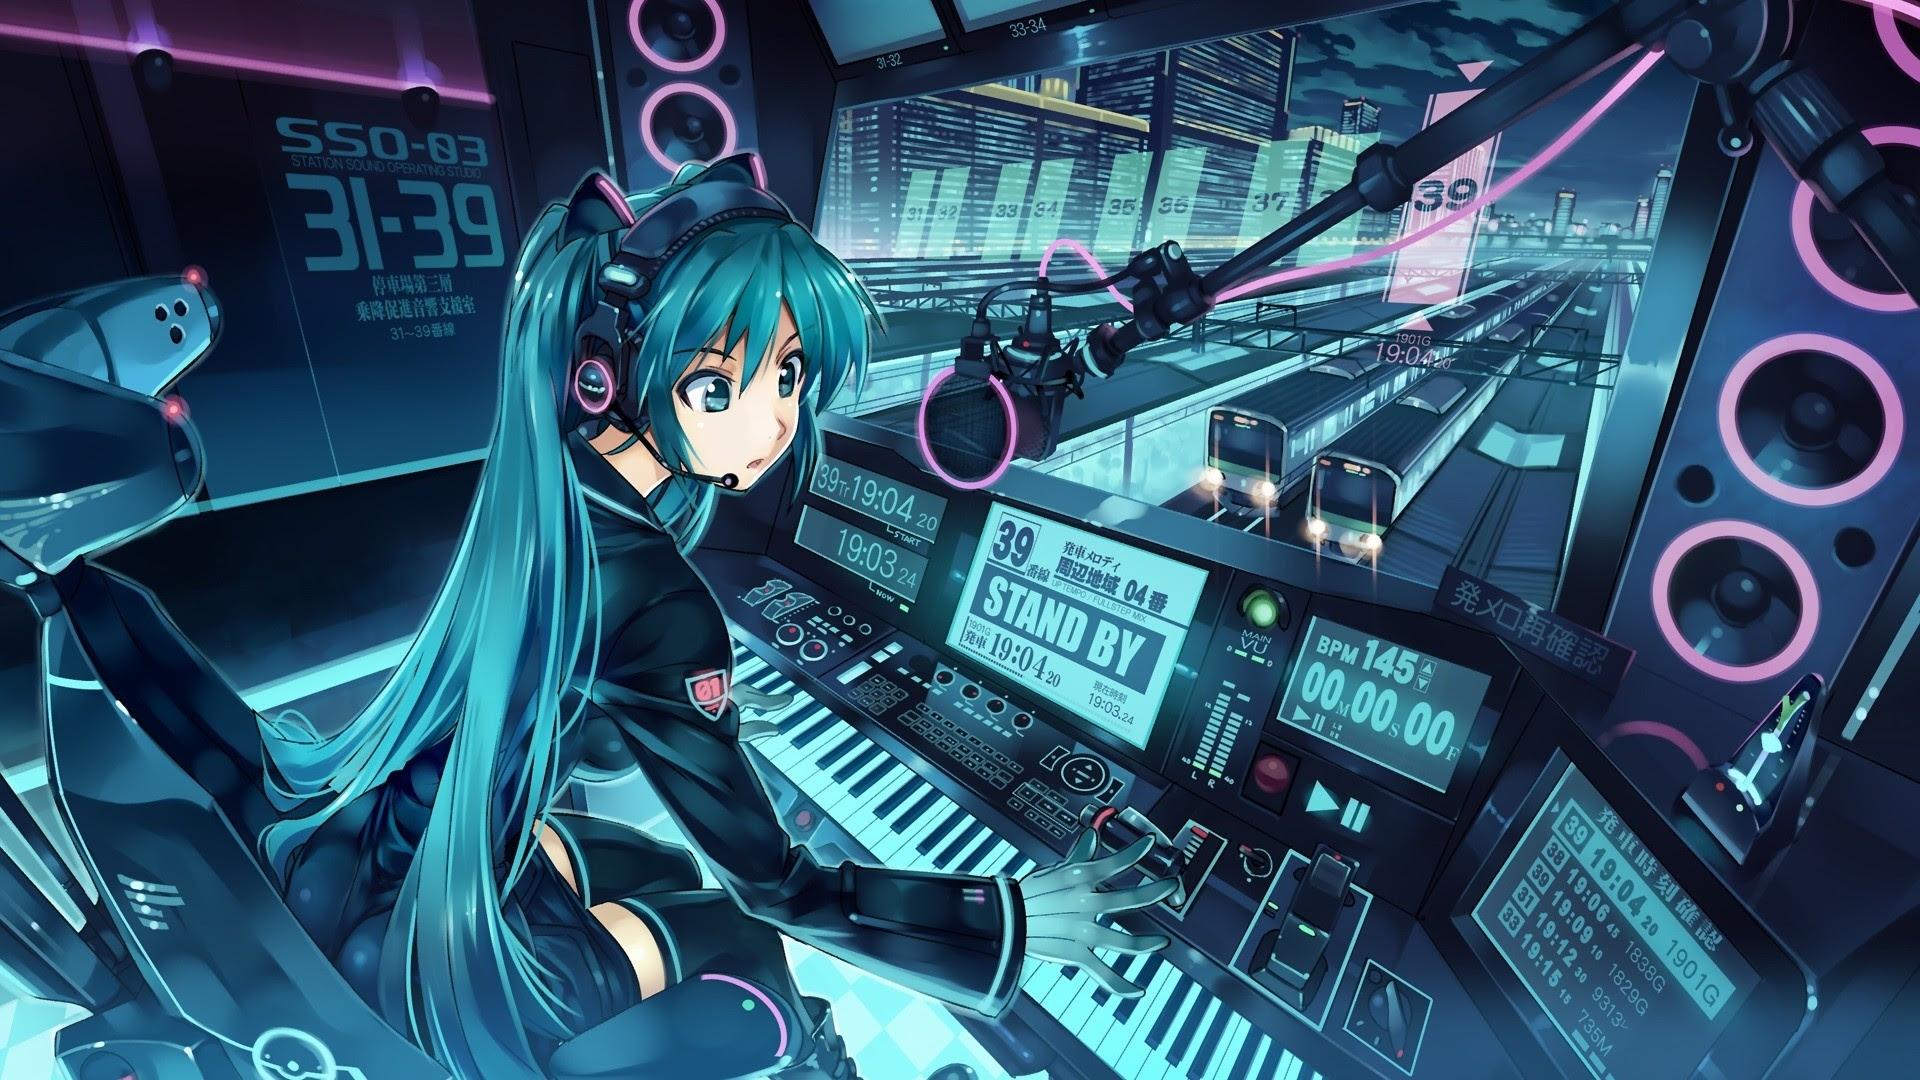 Anime DJ Wallpaper - FunDJStuff.com